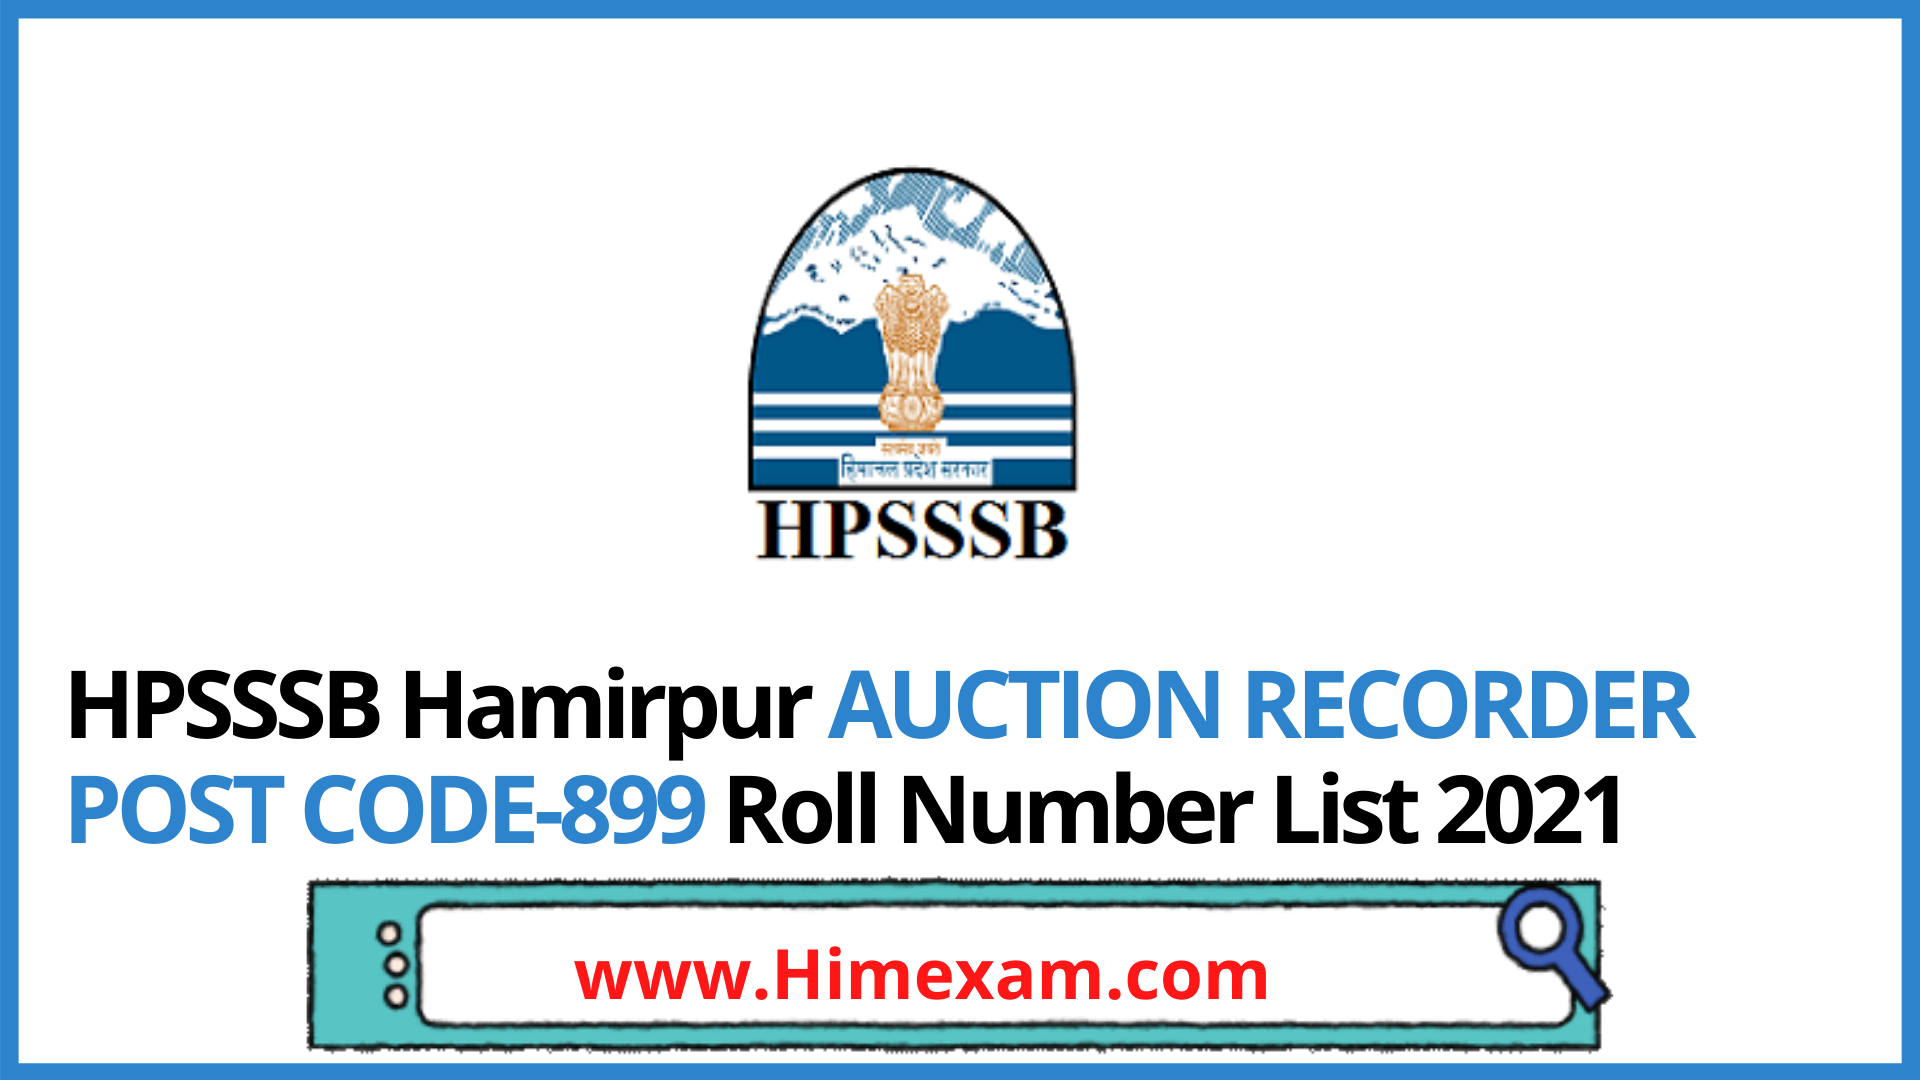 HPSSSB Hamirpur AUCTION RECORDER POST CODE-899 Roll Number List 2021